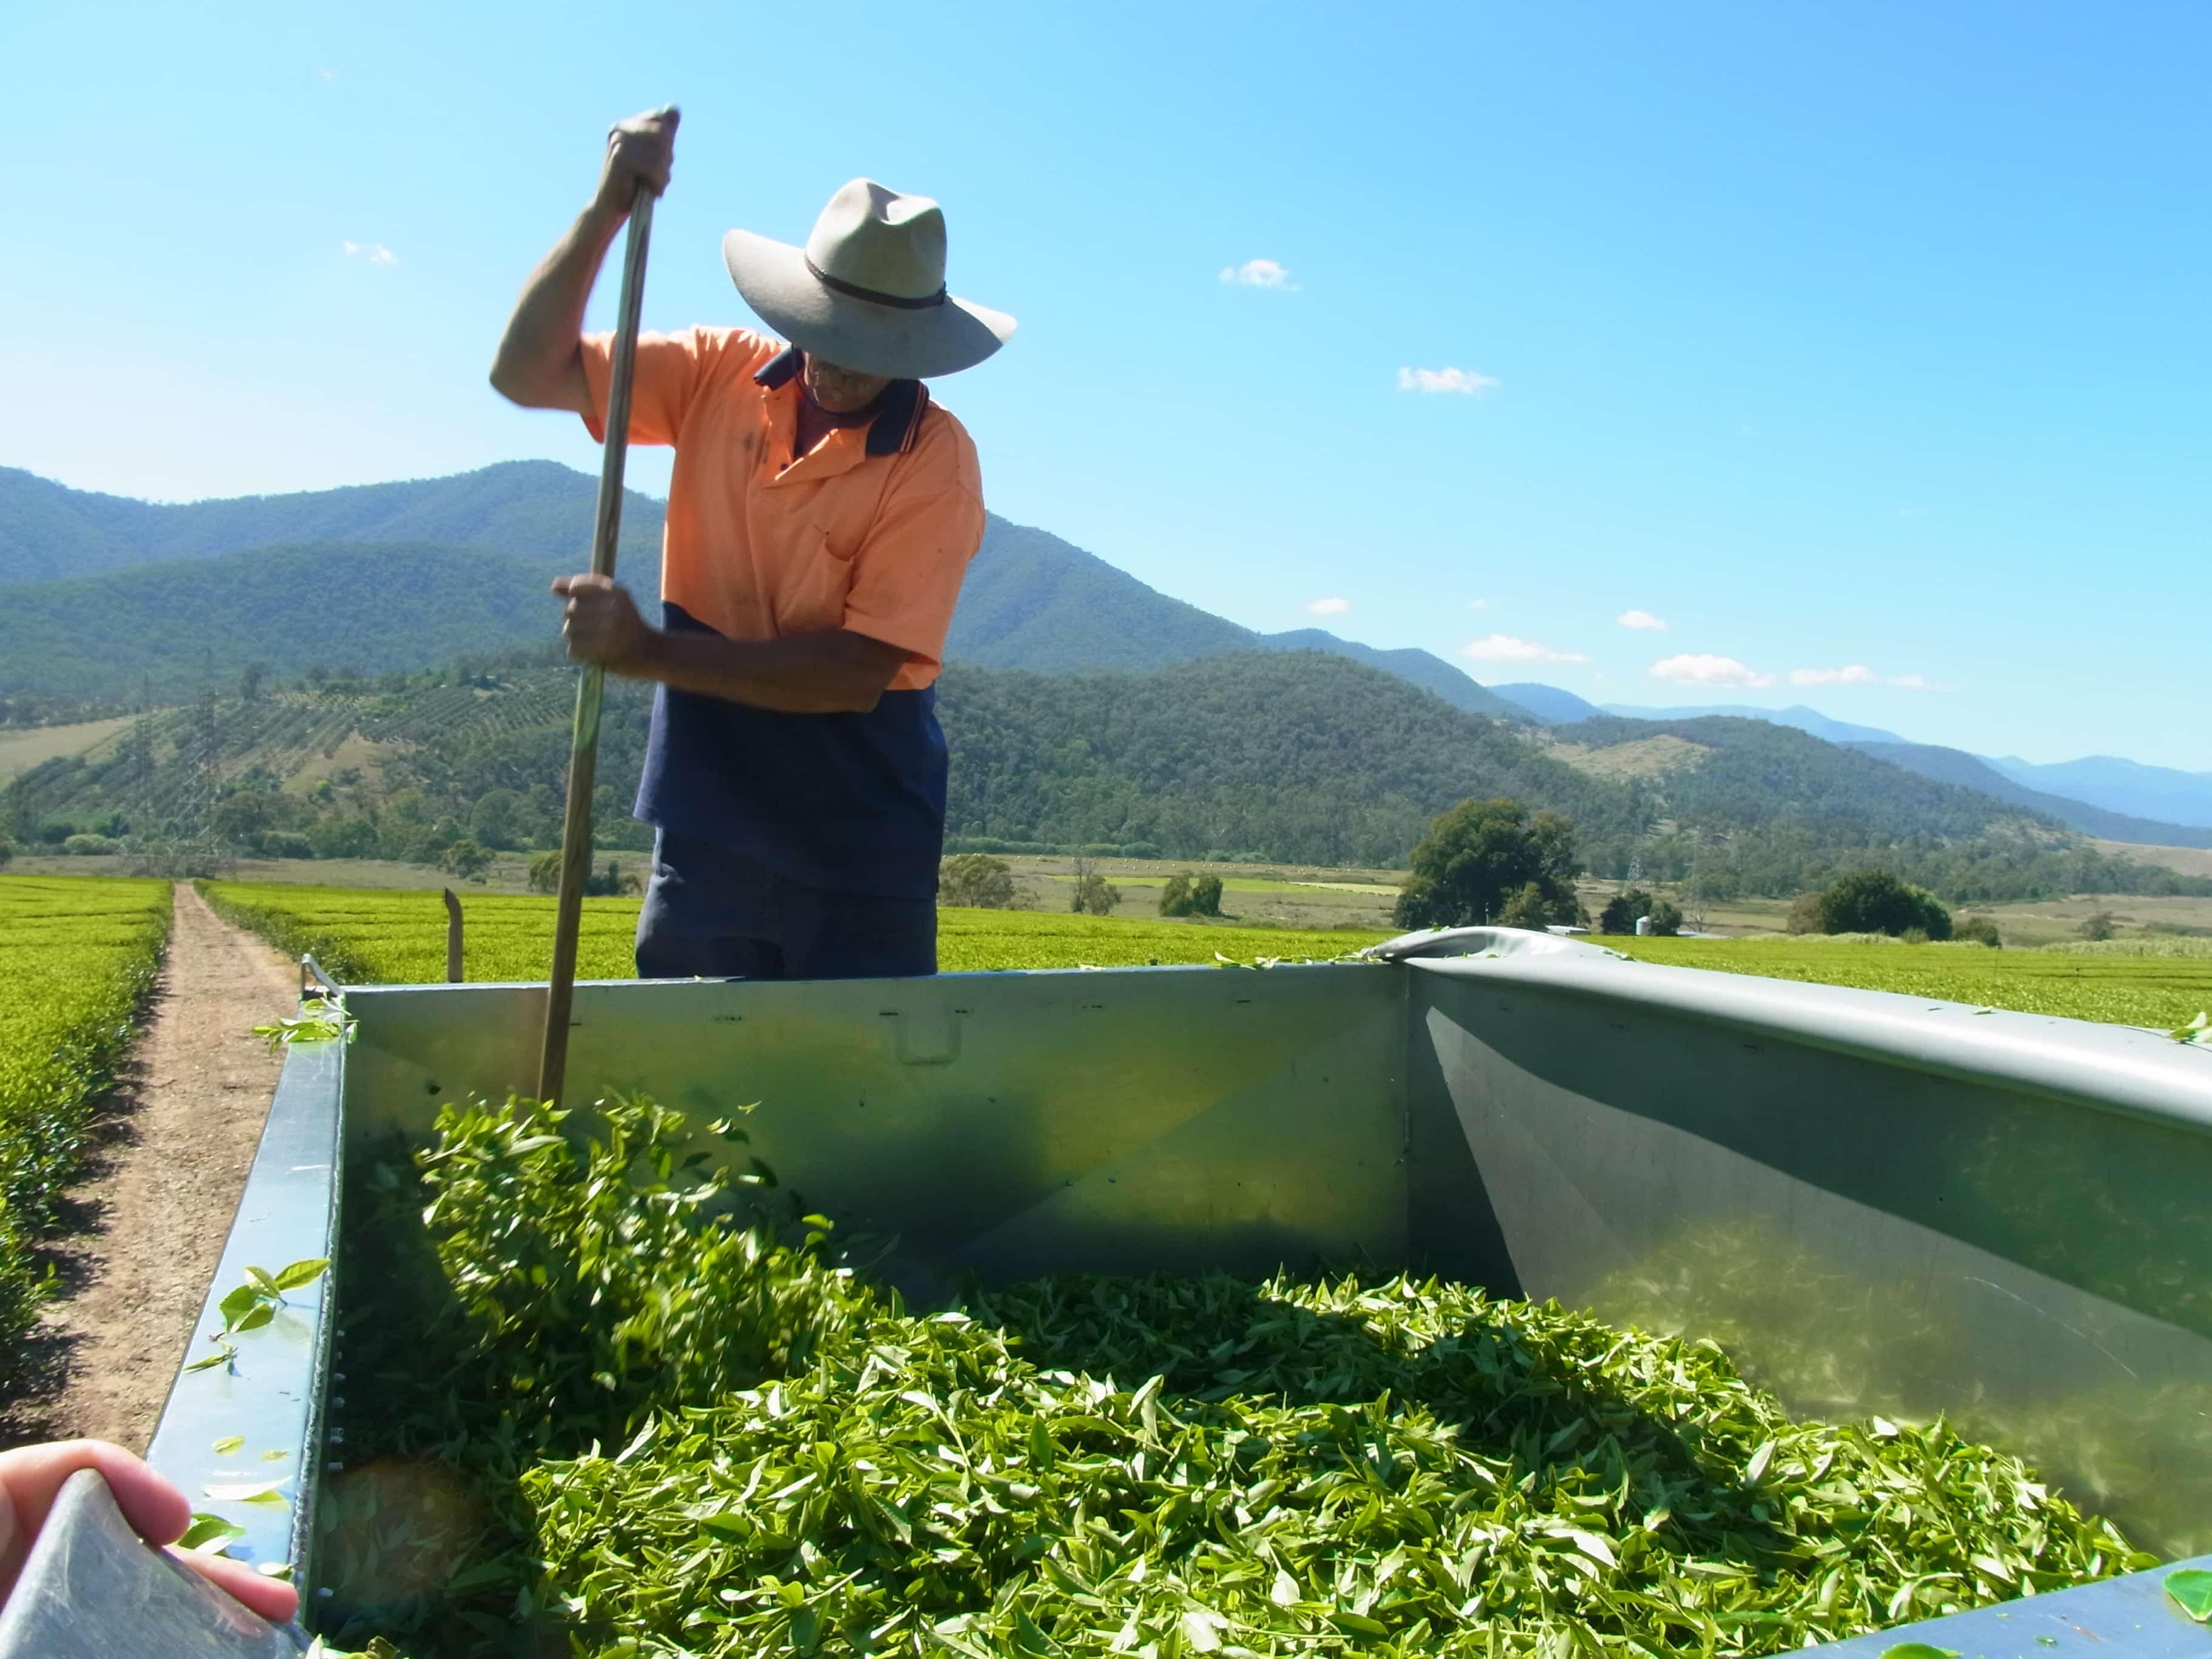 george tending to the tea leaves